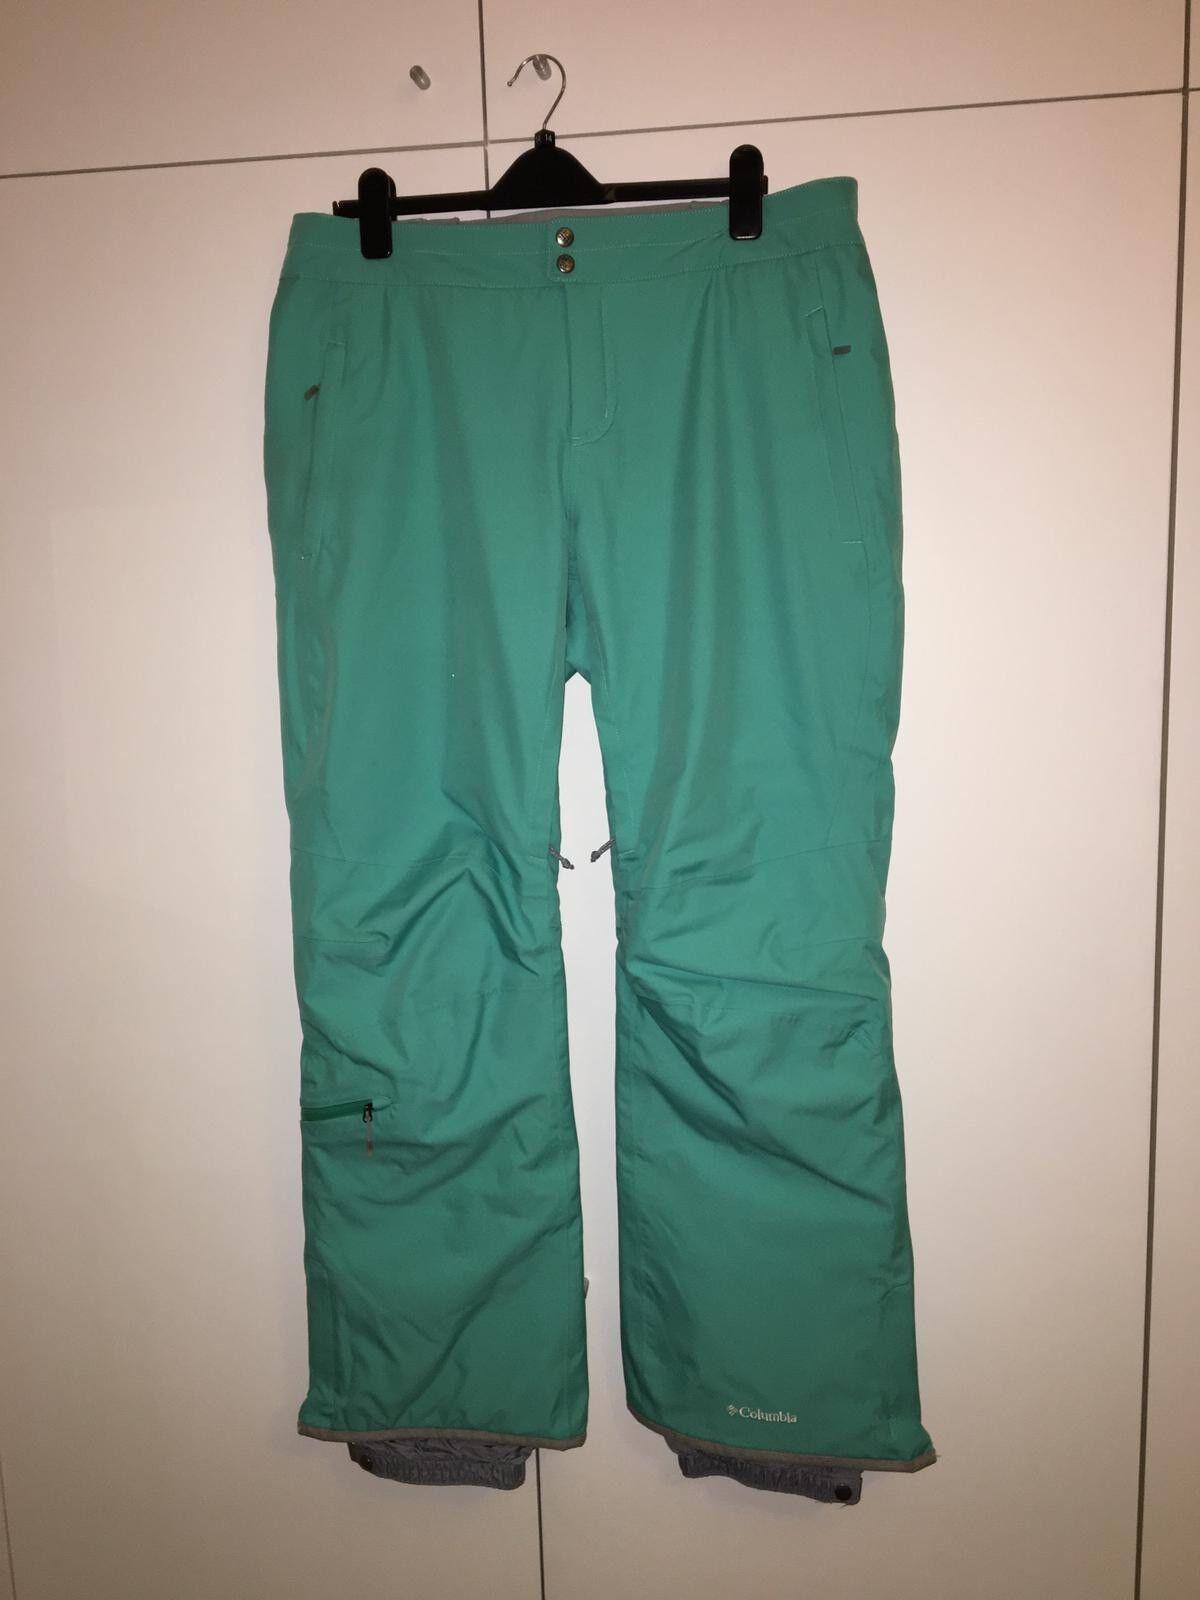 Green Women's Ski Trousers - Columbia - XL